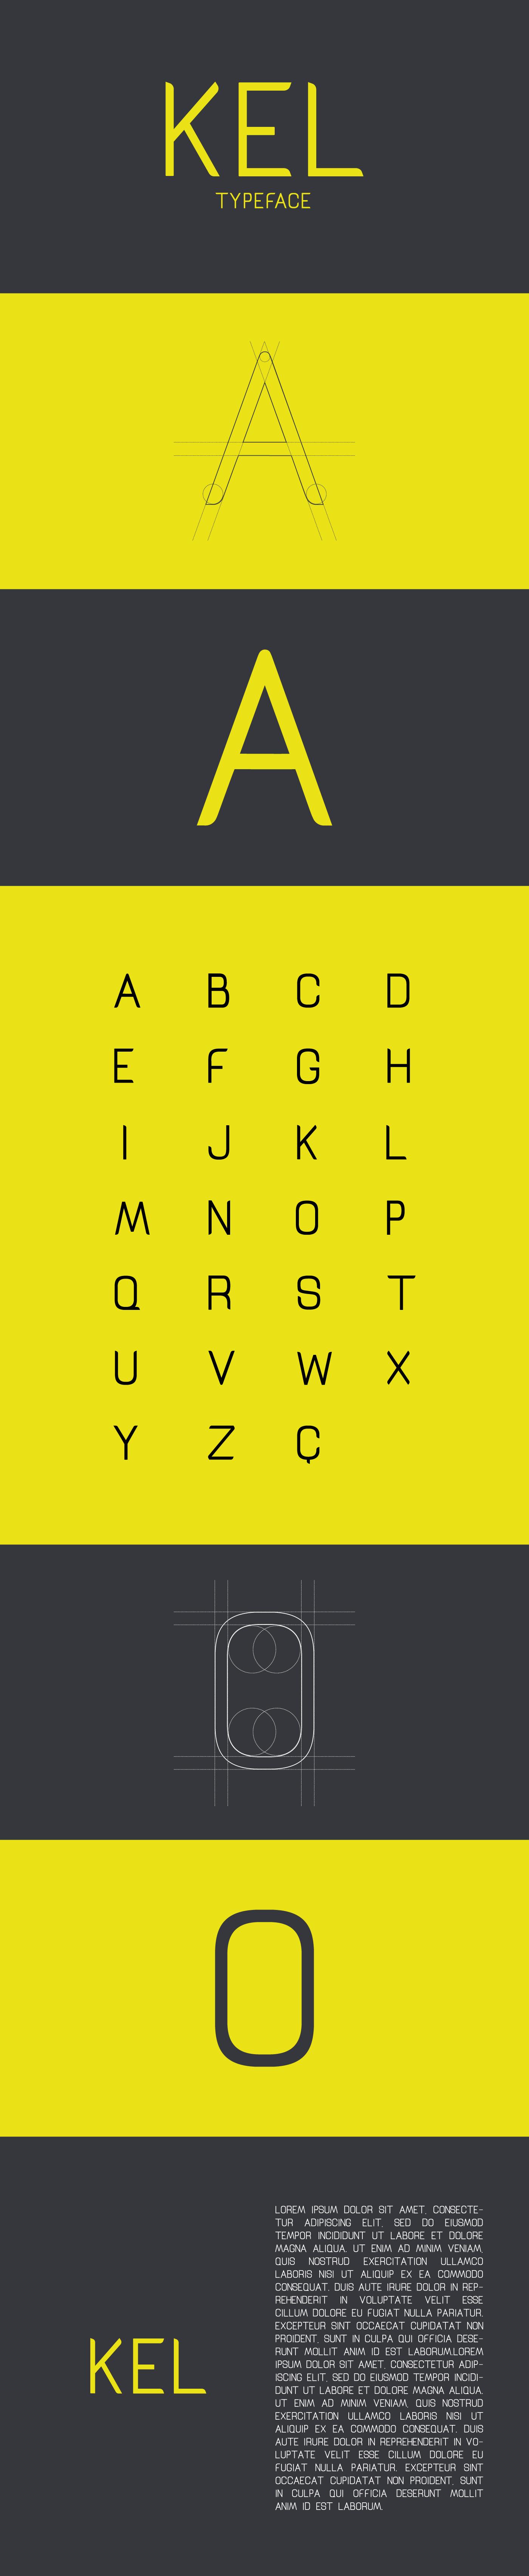 KEL FONT Free font Typeface tipografia fontes